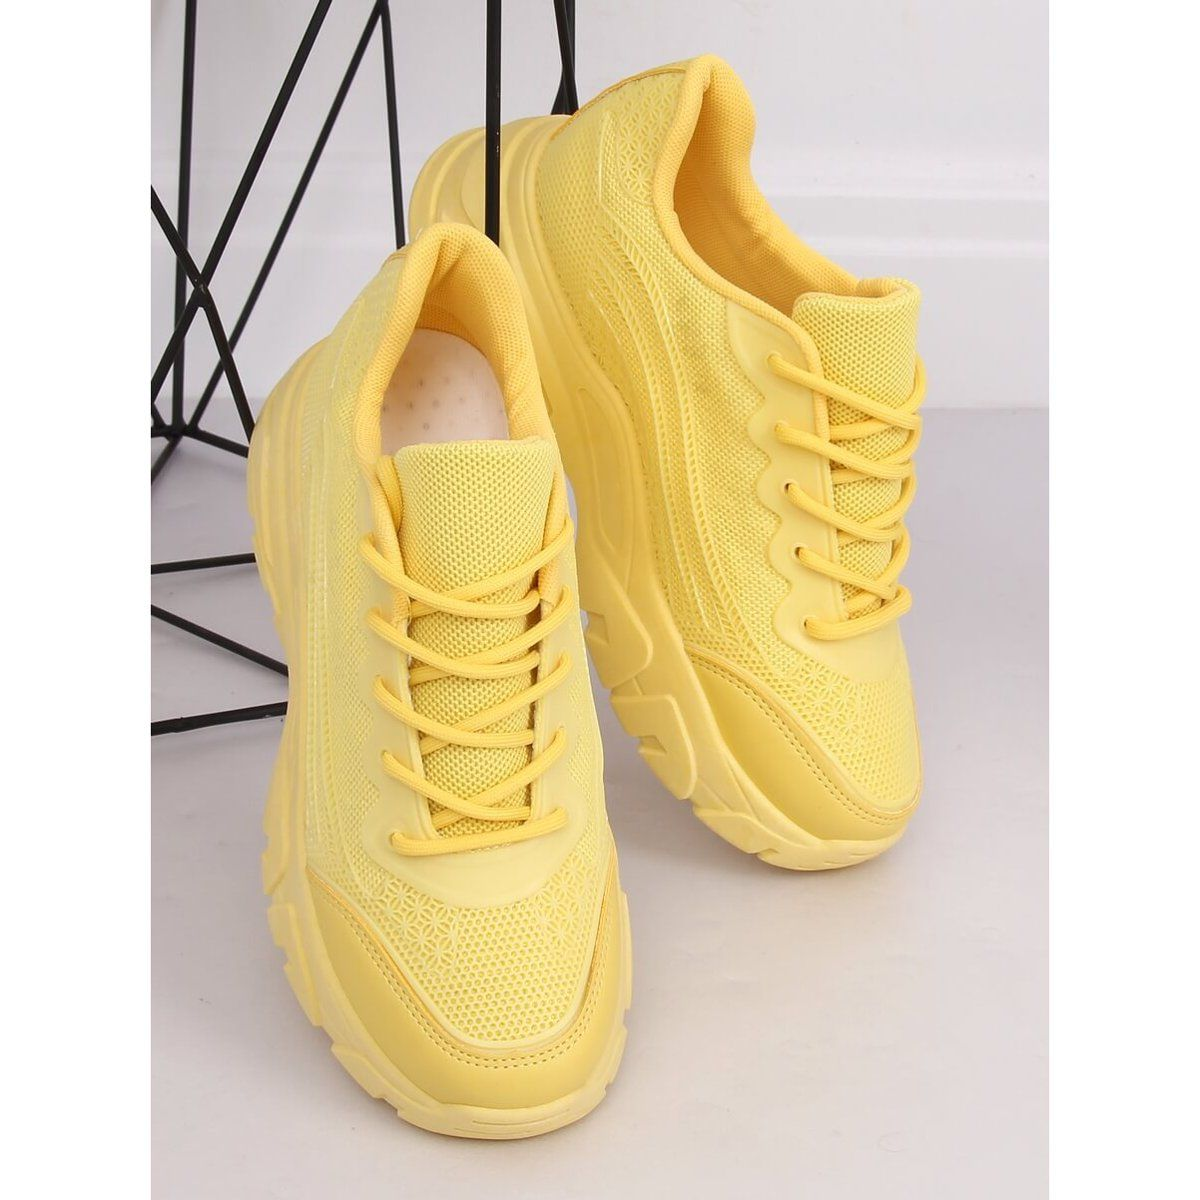 Buty Sportowe Zolte Dml902 Yellow Sneakers White Sneaker Shoes